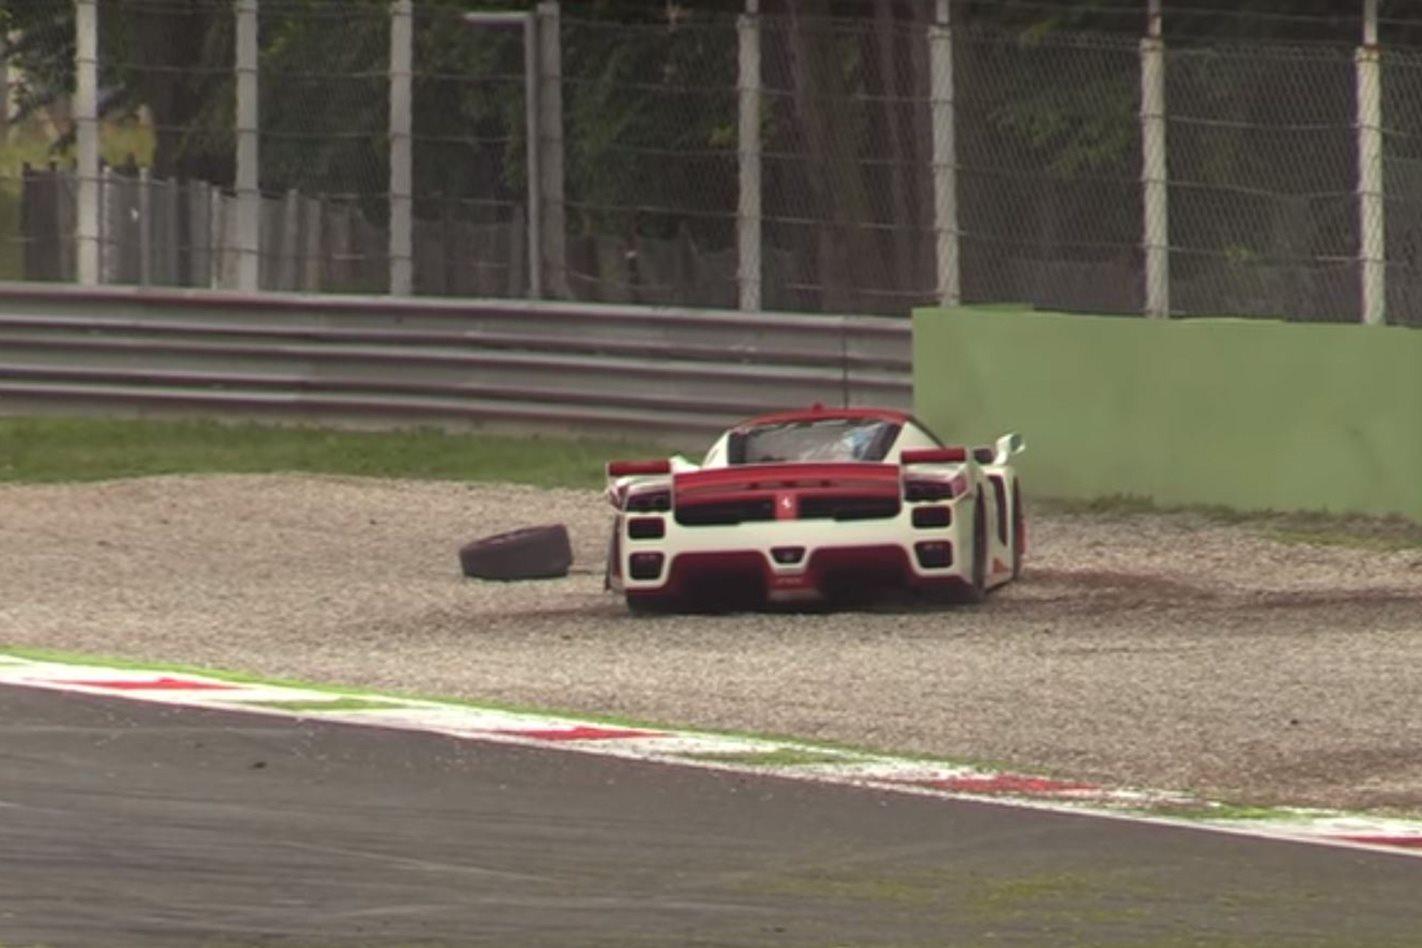 Ferrari FXX Evoluzione crashed